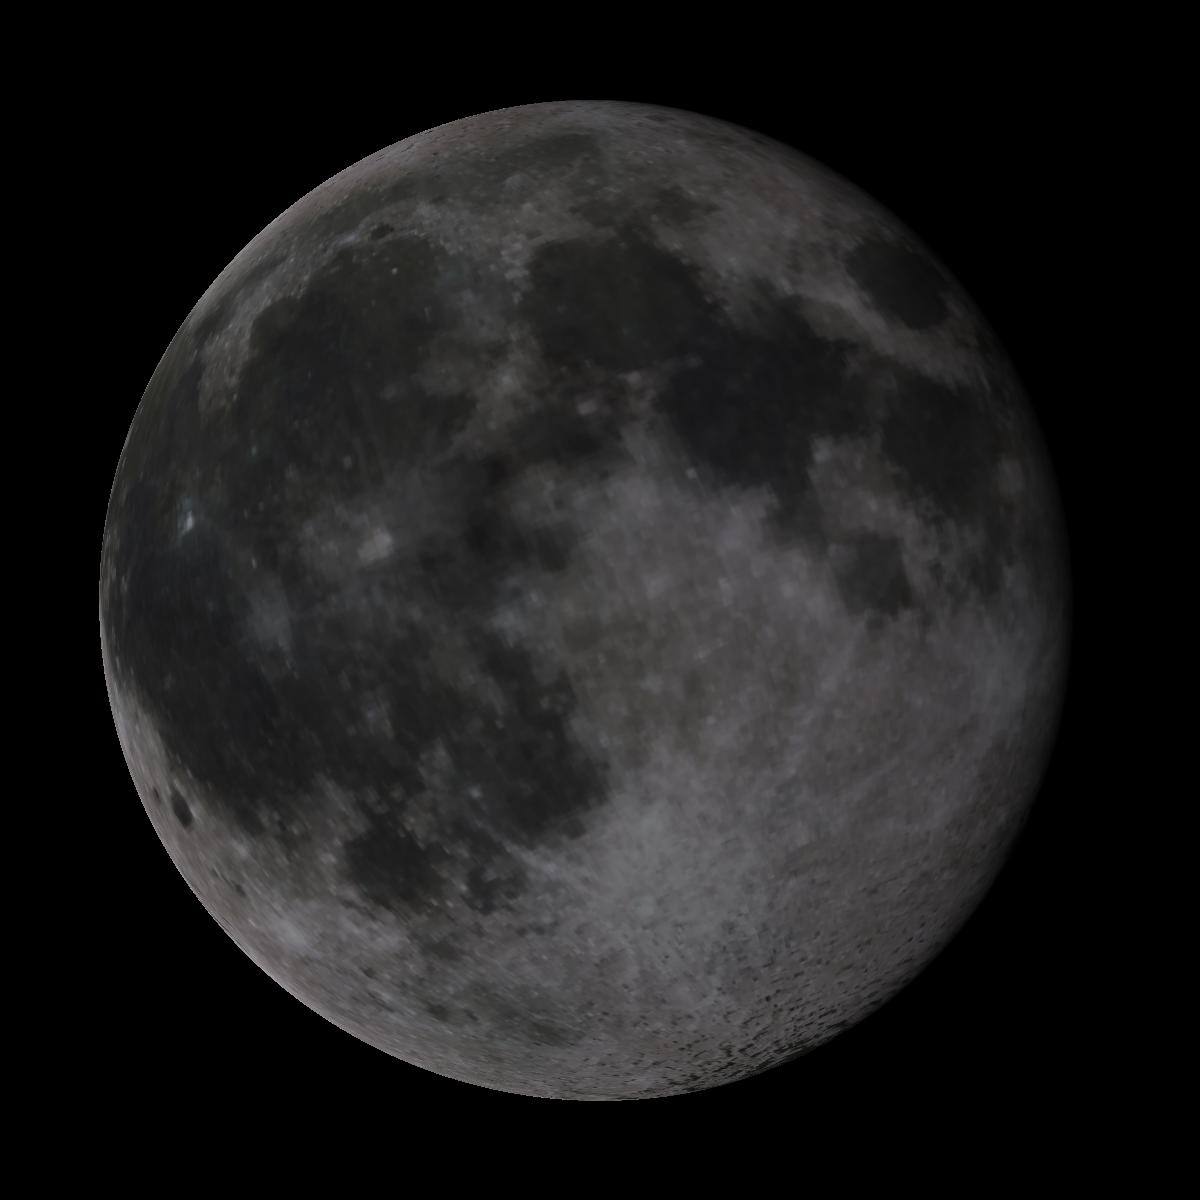 Lune du 11 mars 2020